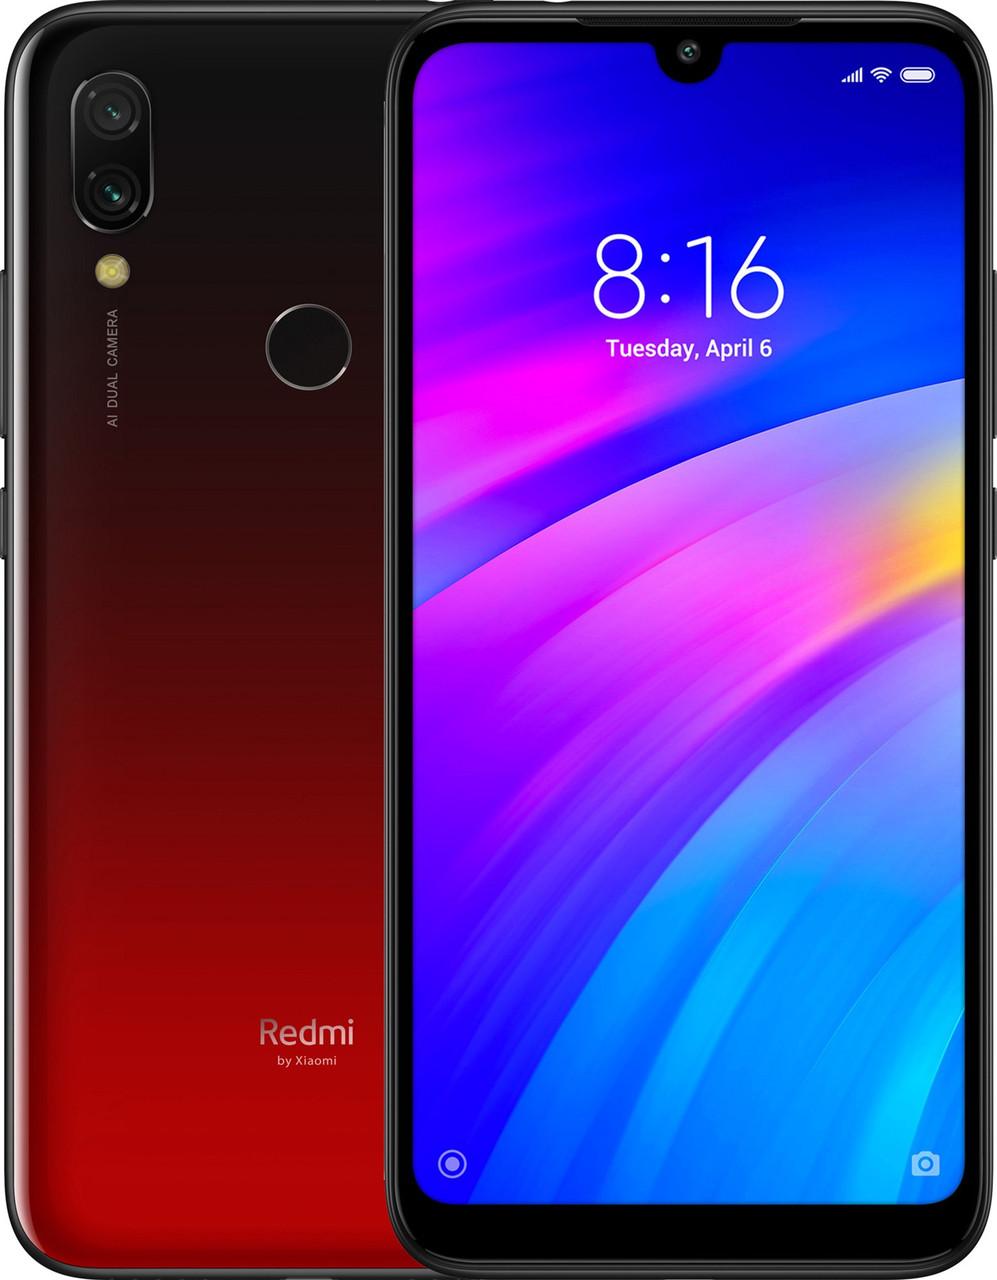 Xiaomi Redmi 7 3/64 | Красный | 4G/LTE | Международная версия | Гарантия